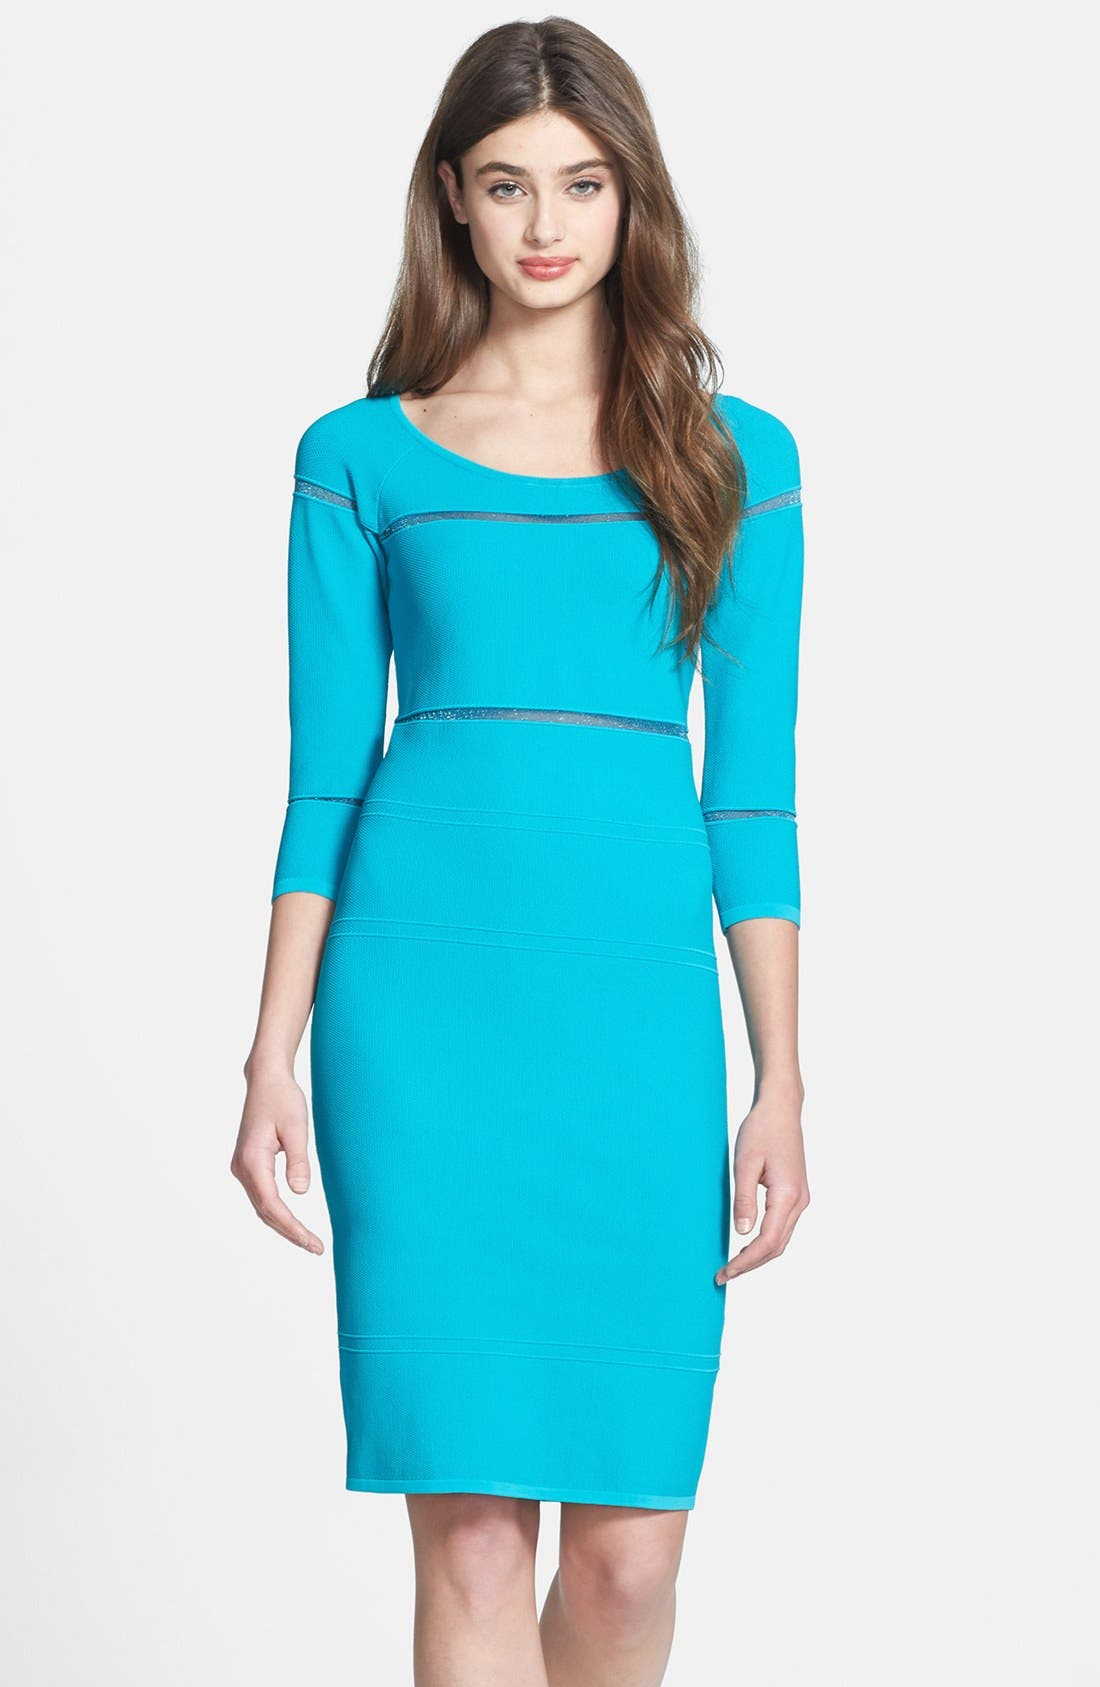 Alternate Image 1 Selected - Nicole Miller Illusion Inset Bandage Knit Dress